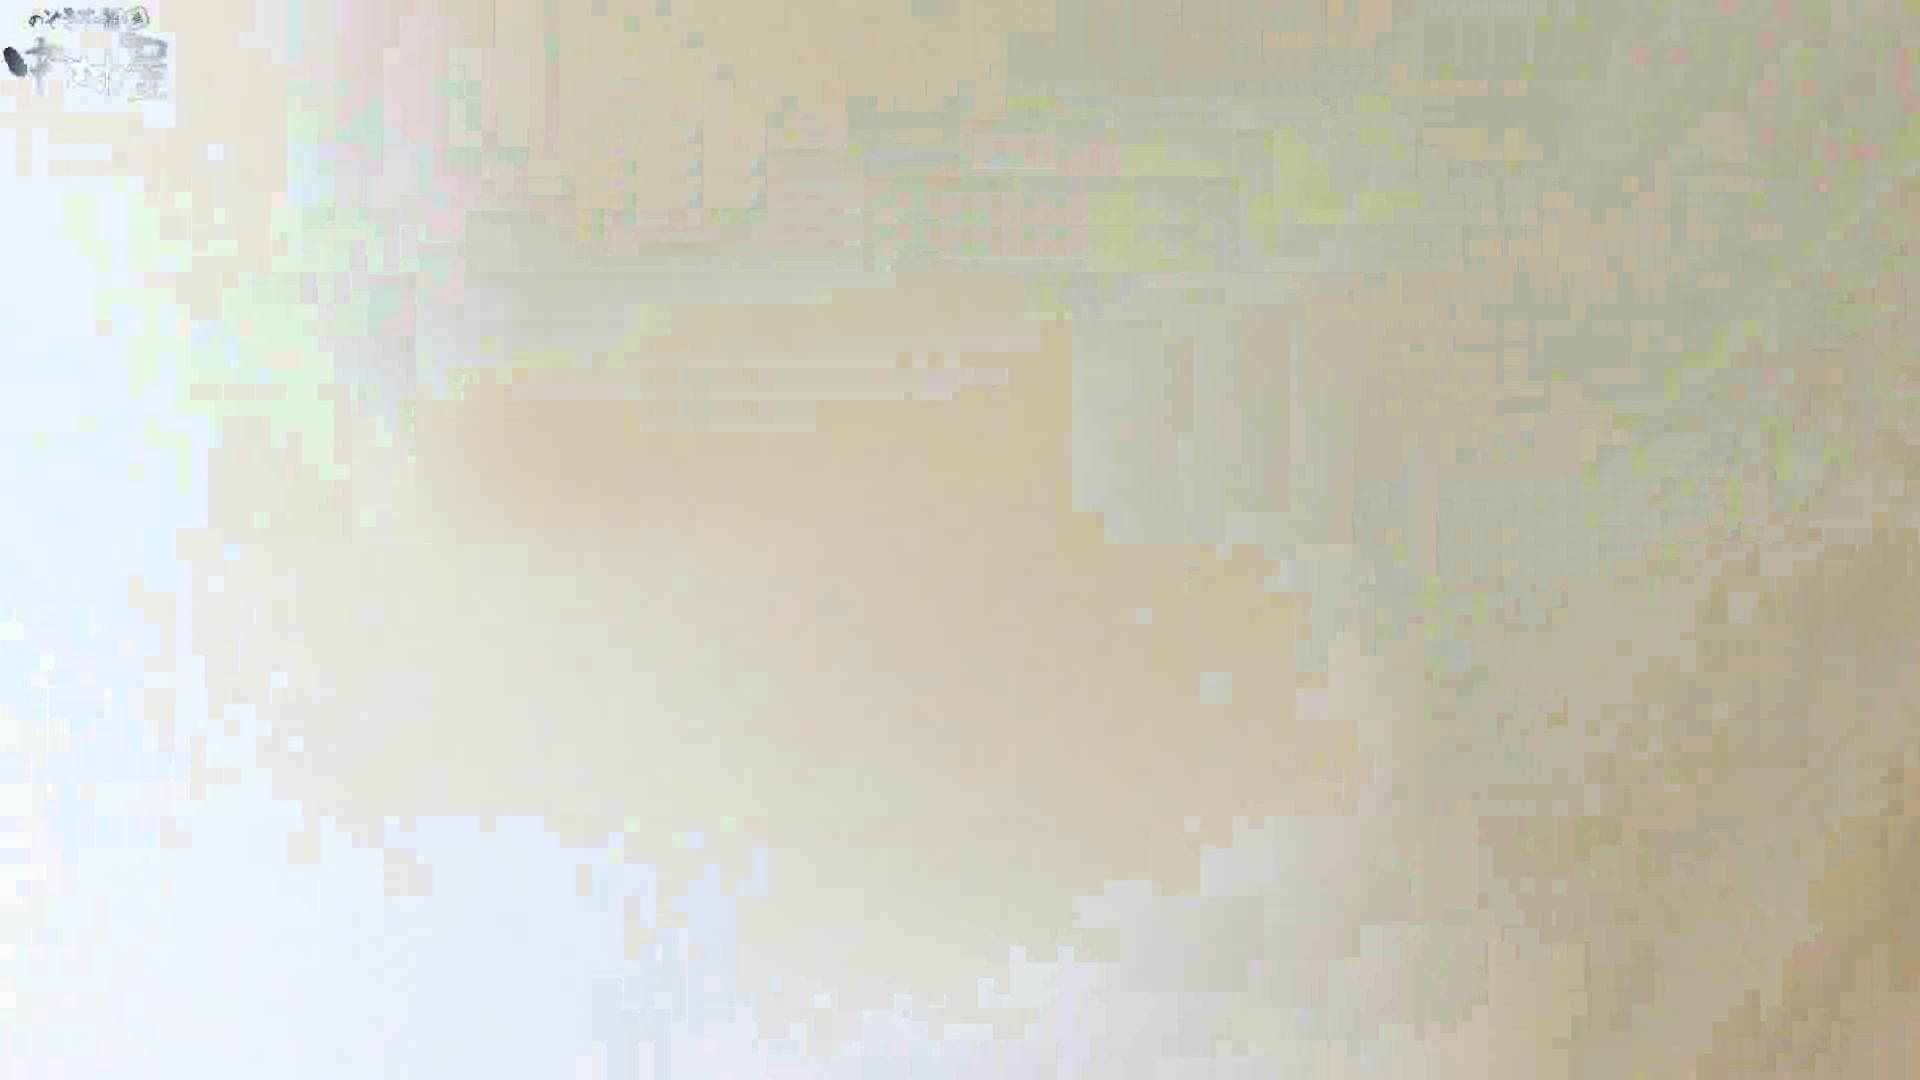 部活女子トイレ潜入編vol.3 潜入 AV無料 75画像 13